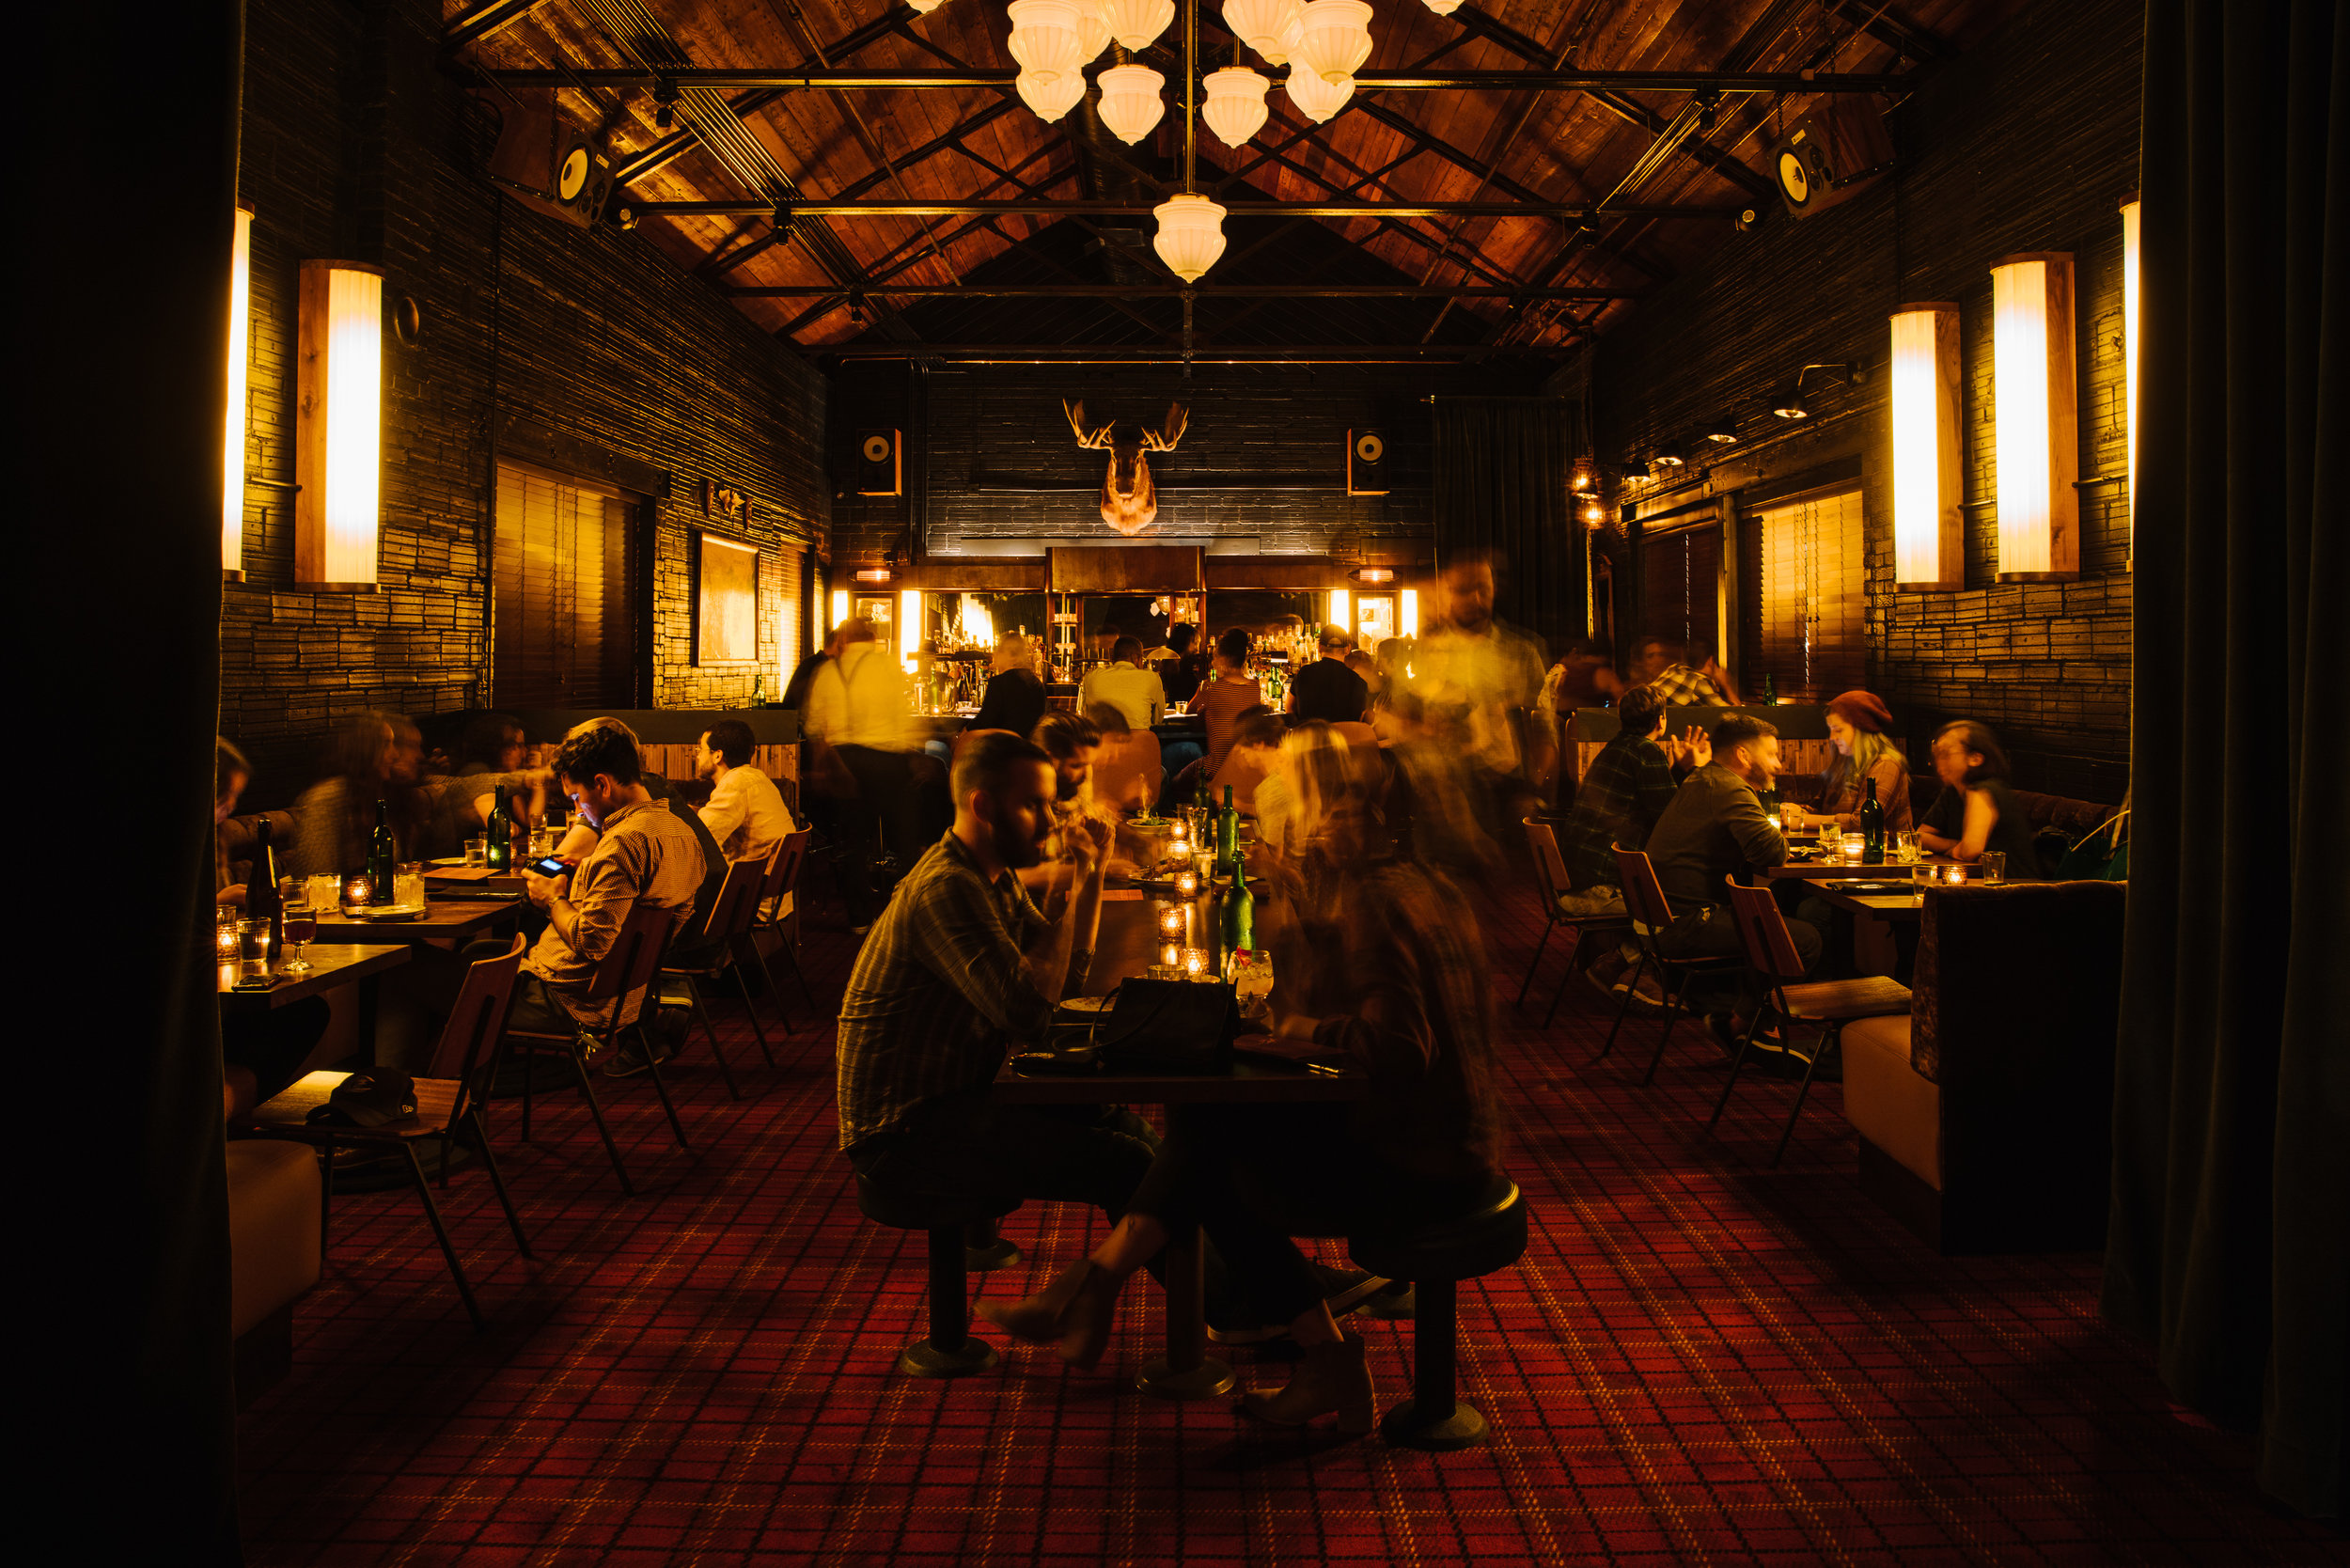 Golden Eagle Dining Room, designed by Elizabeth Ingram. Photo: Andrew Thomas Lee